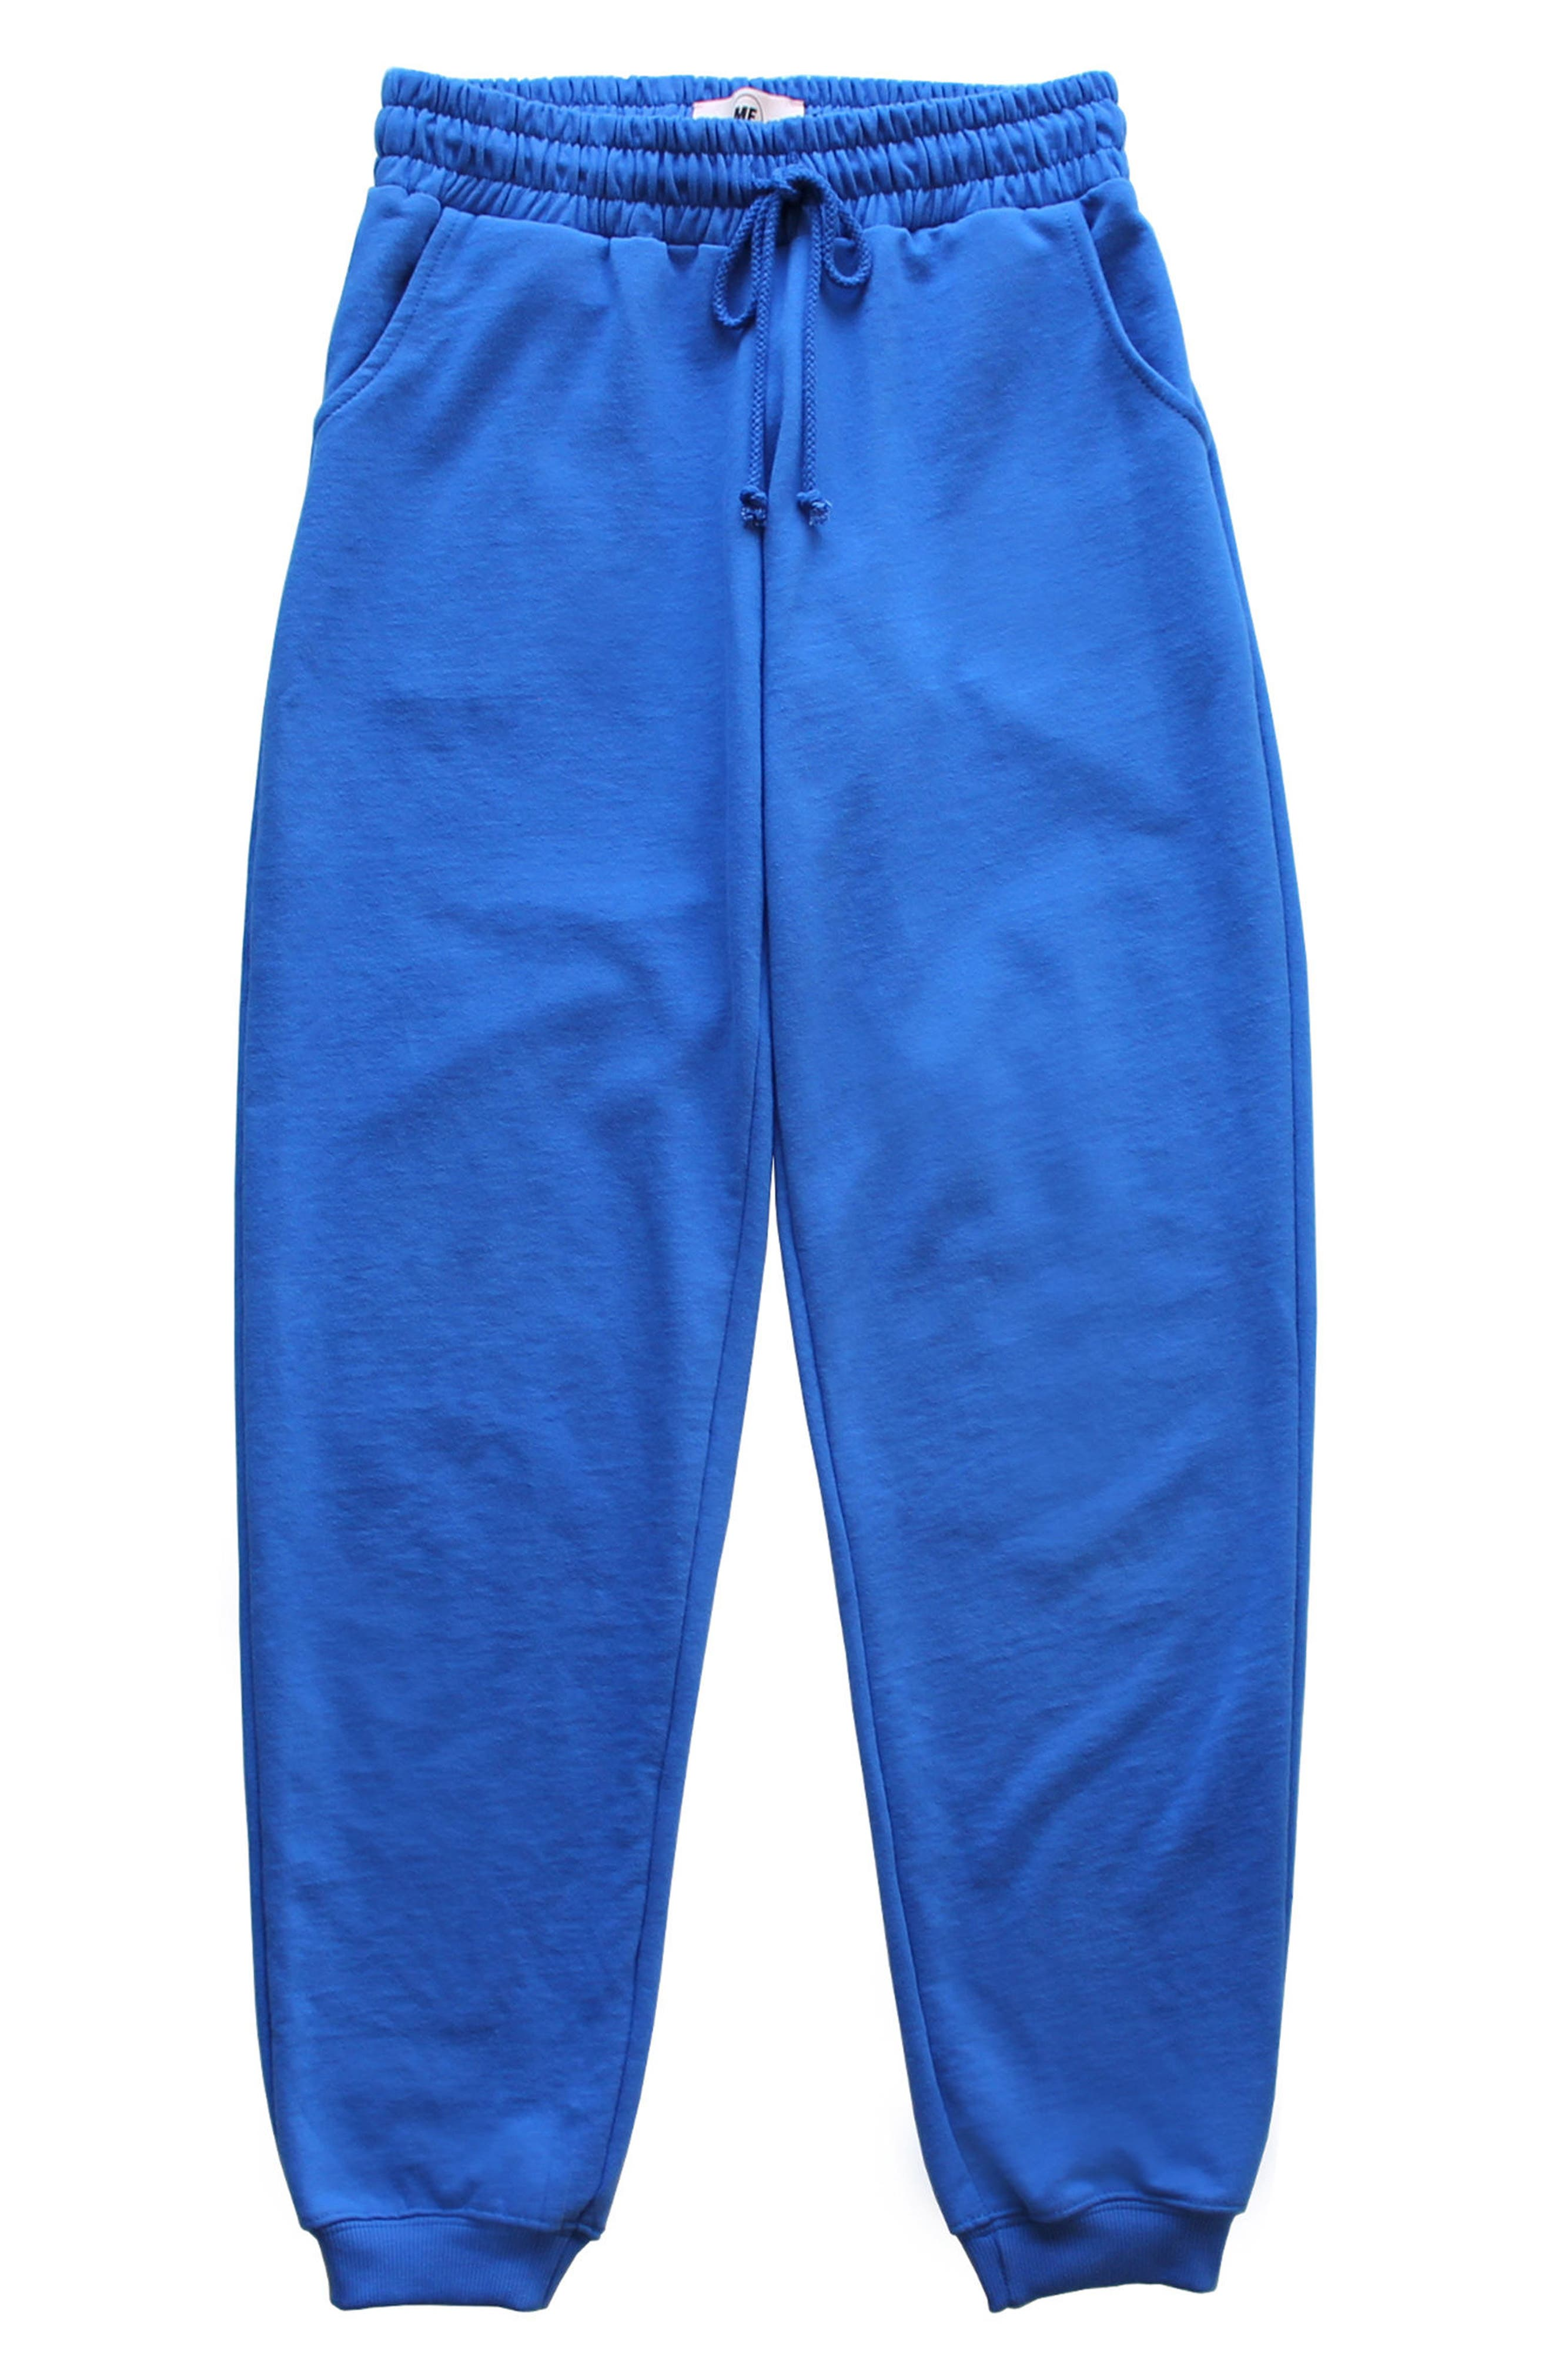 ME. Rose Sweatpants,                         Main,                         color, 400